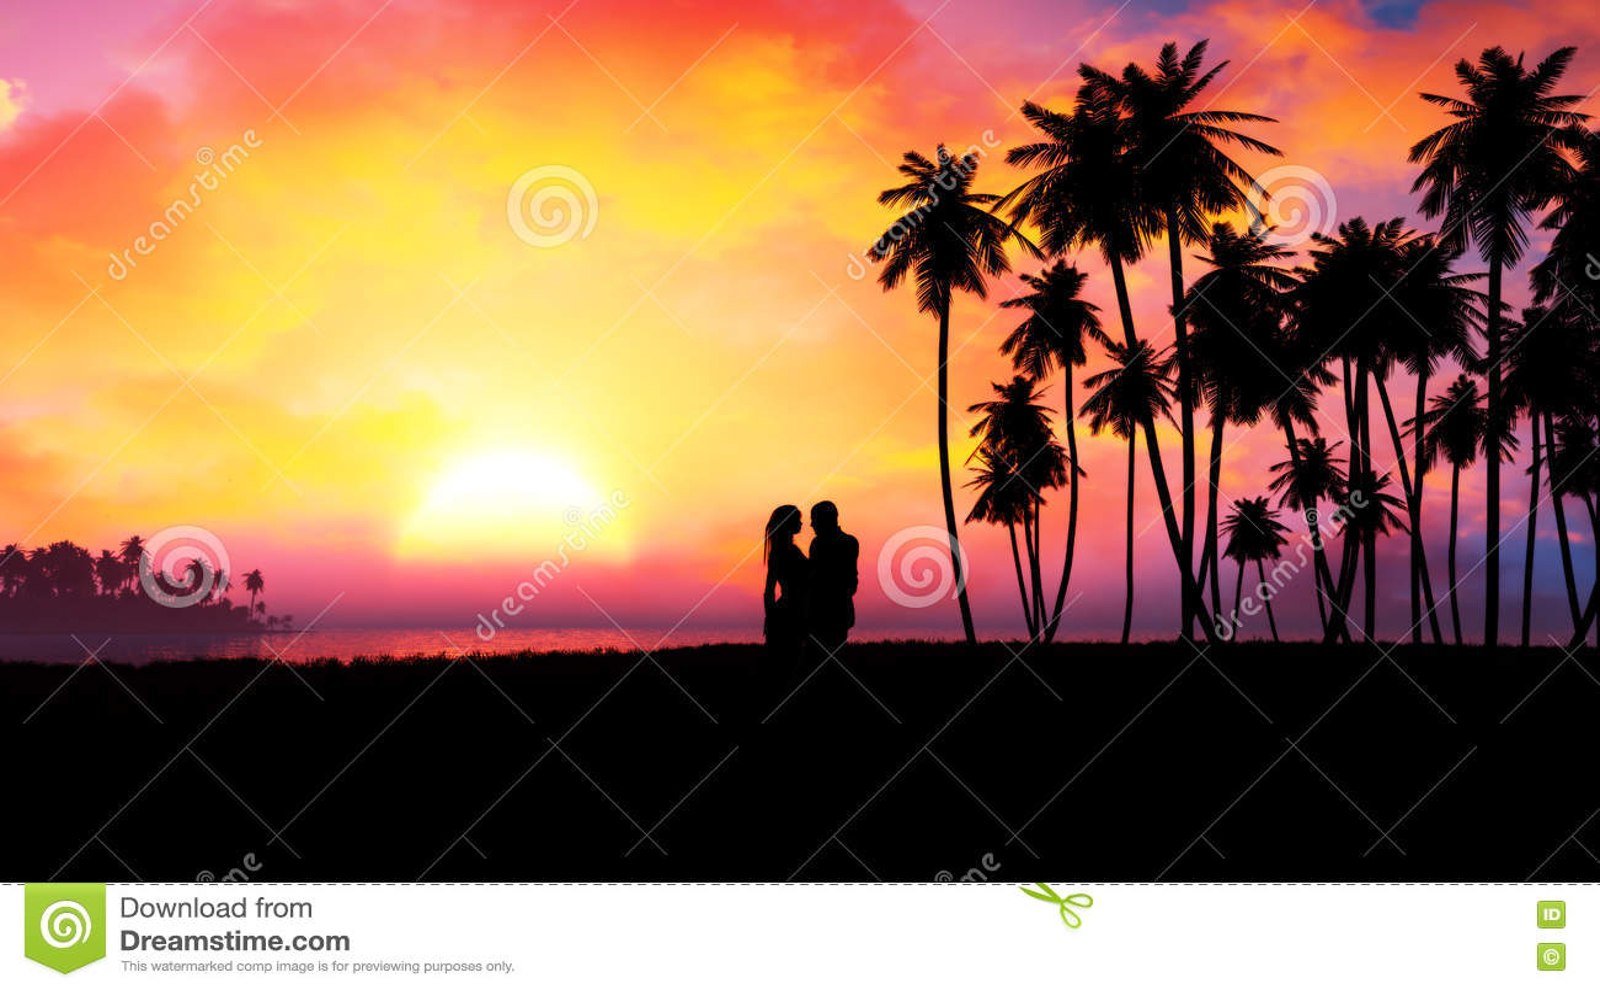 Download Romantic Couple Silhouette In Epic Sunset Stock Illustration - Illustration of dawn, design: 74622512